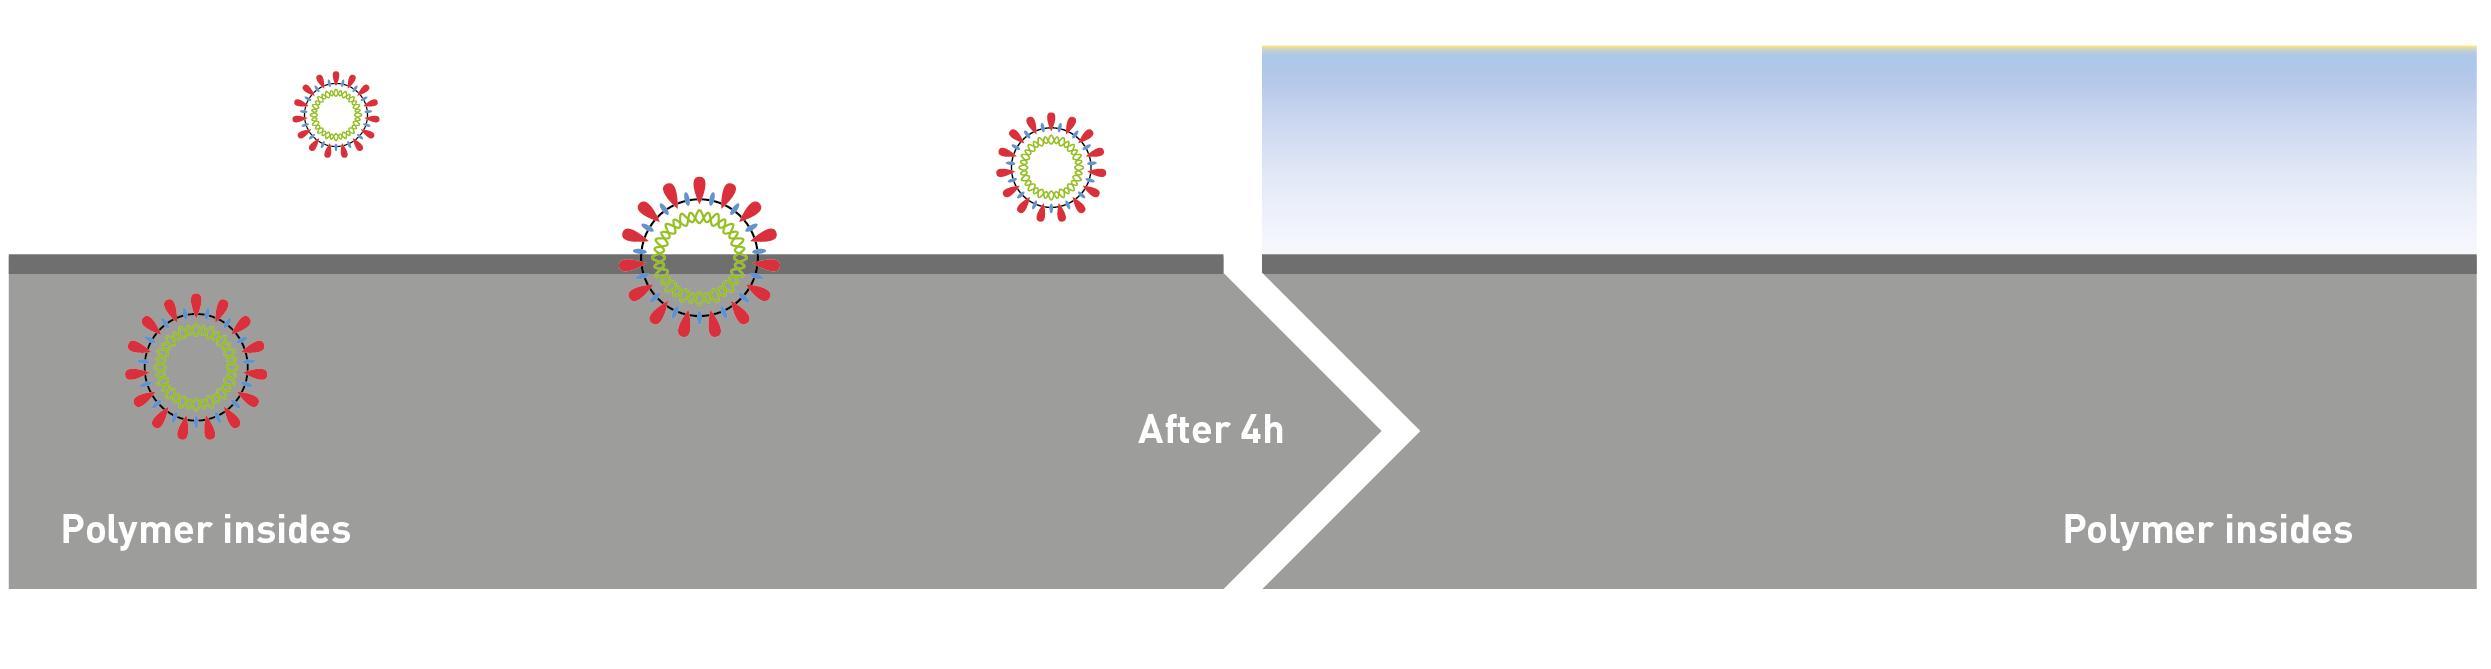 VI_SAFE Antiviral activity after 4h exposure